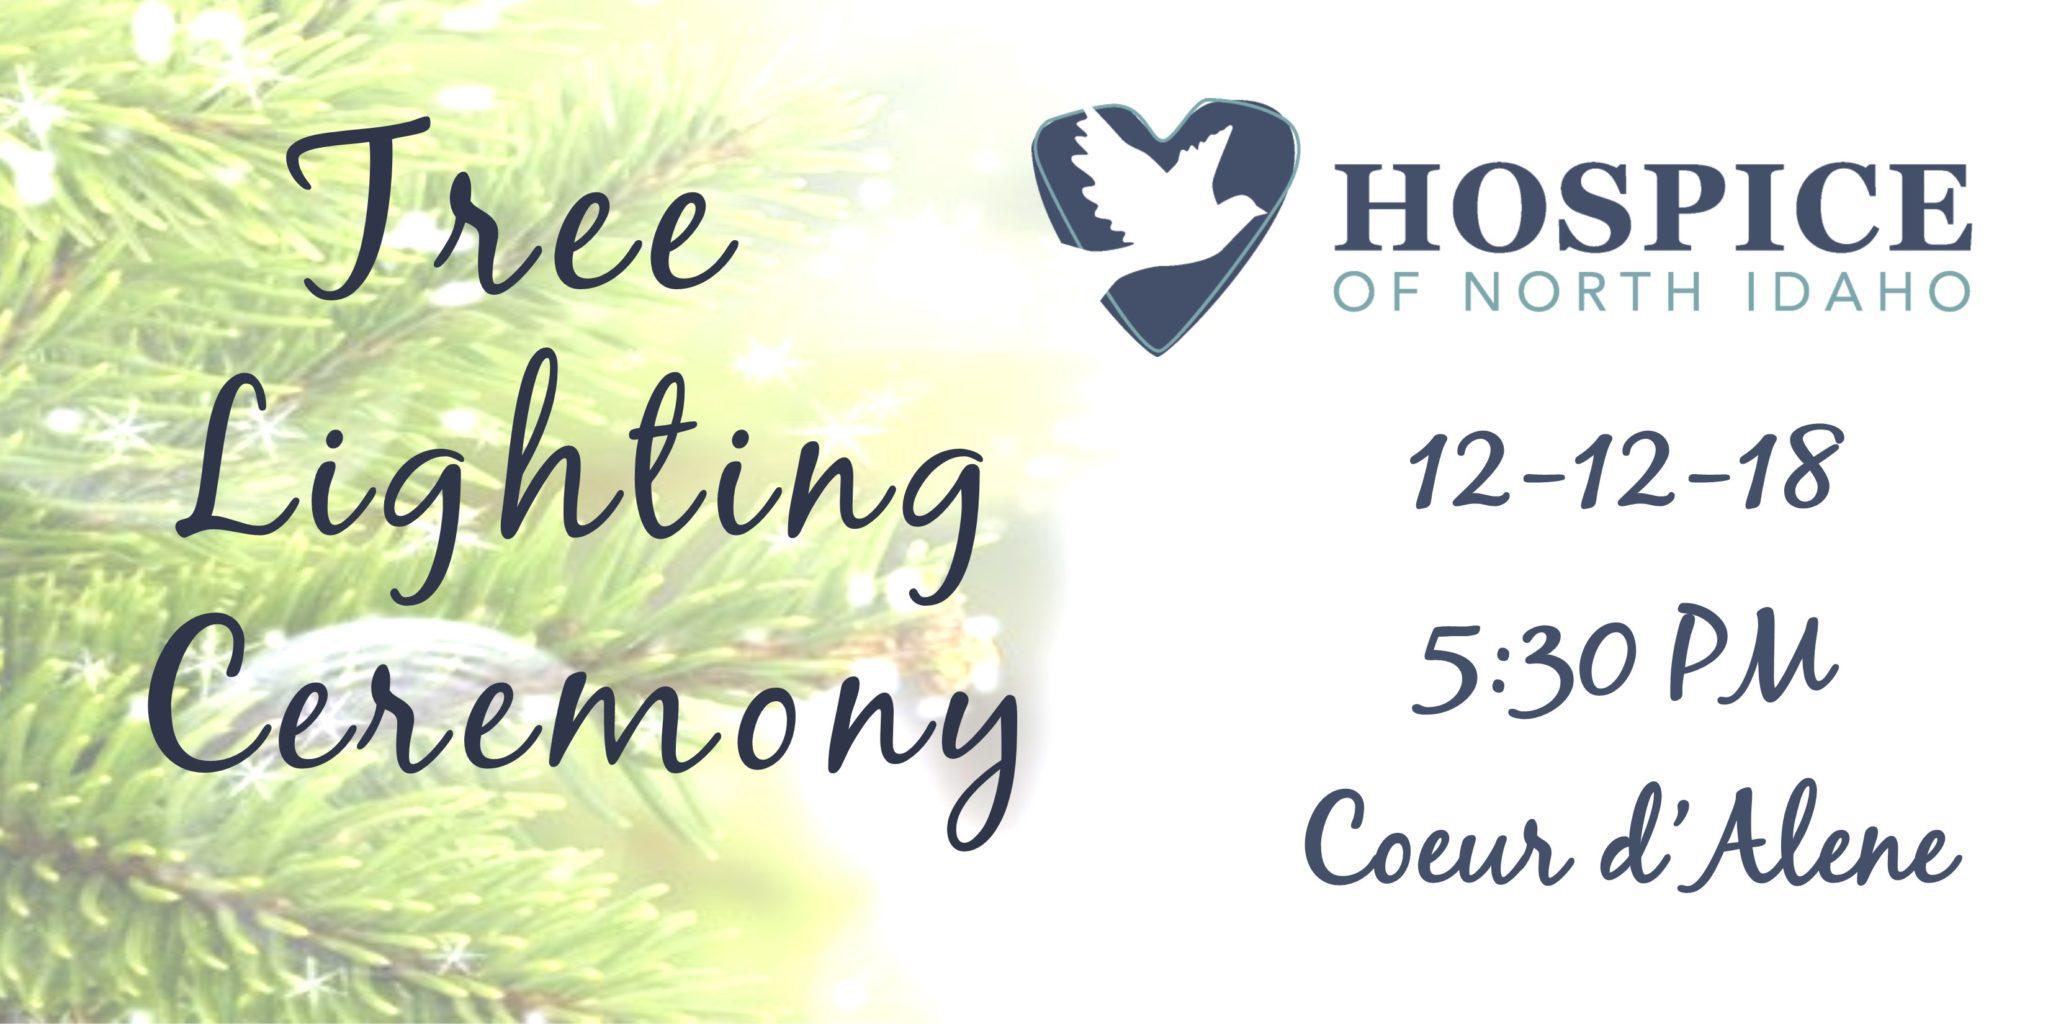 Tree Lighting Ceremony Post Falls December 12 5:00 pm HONI